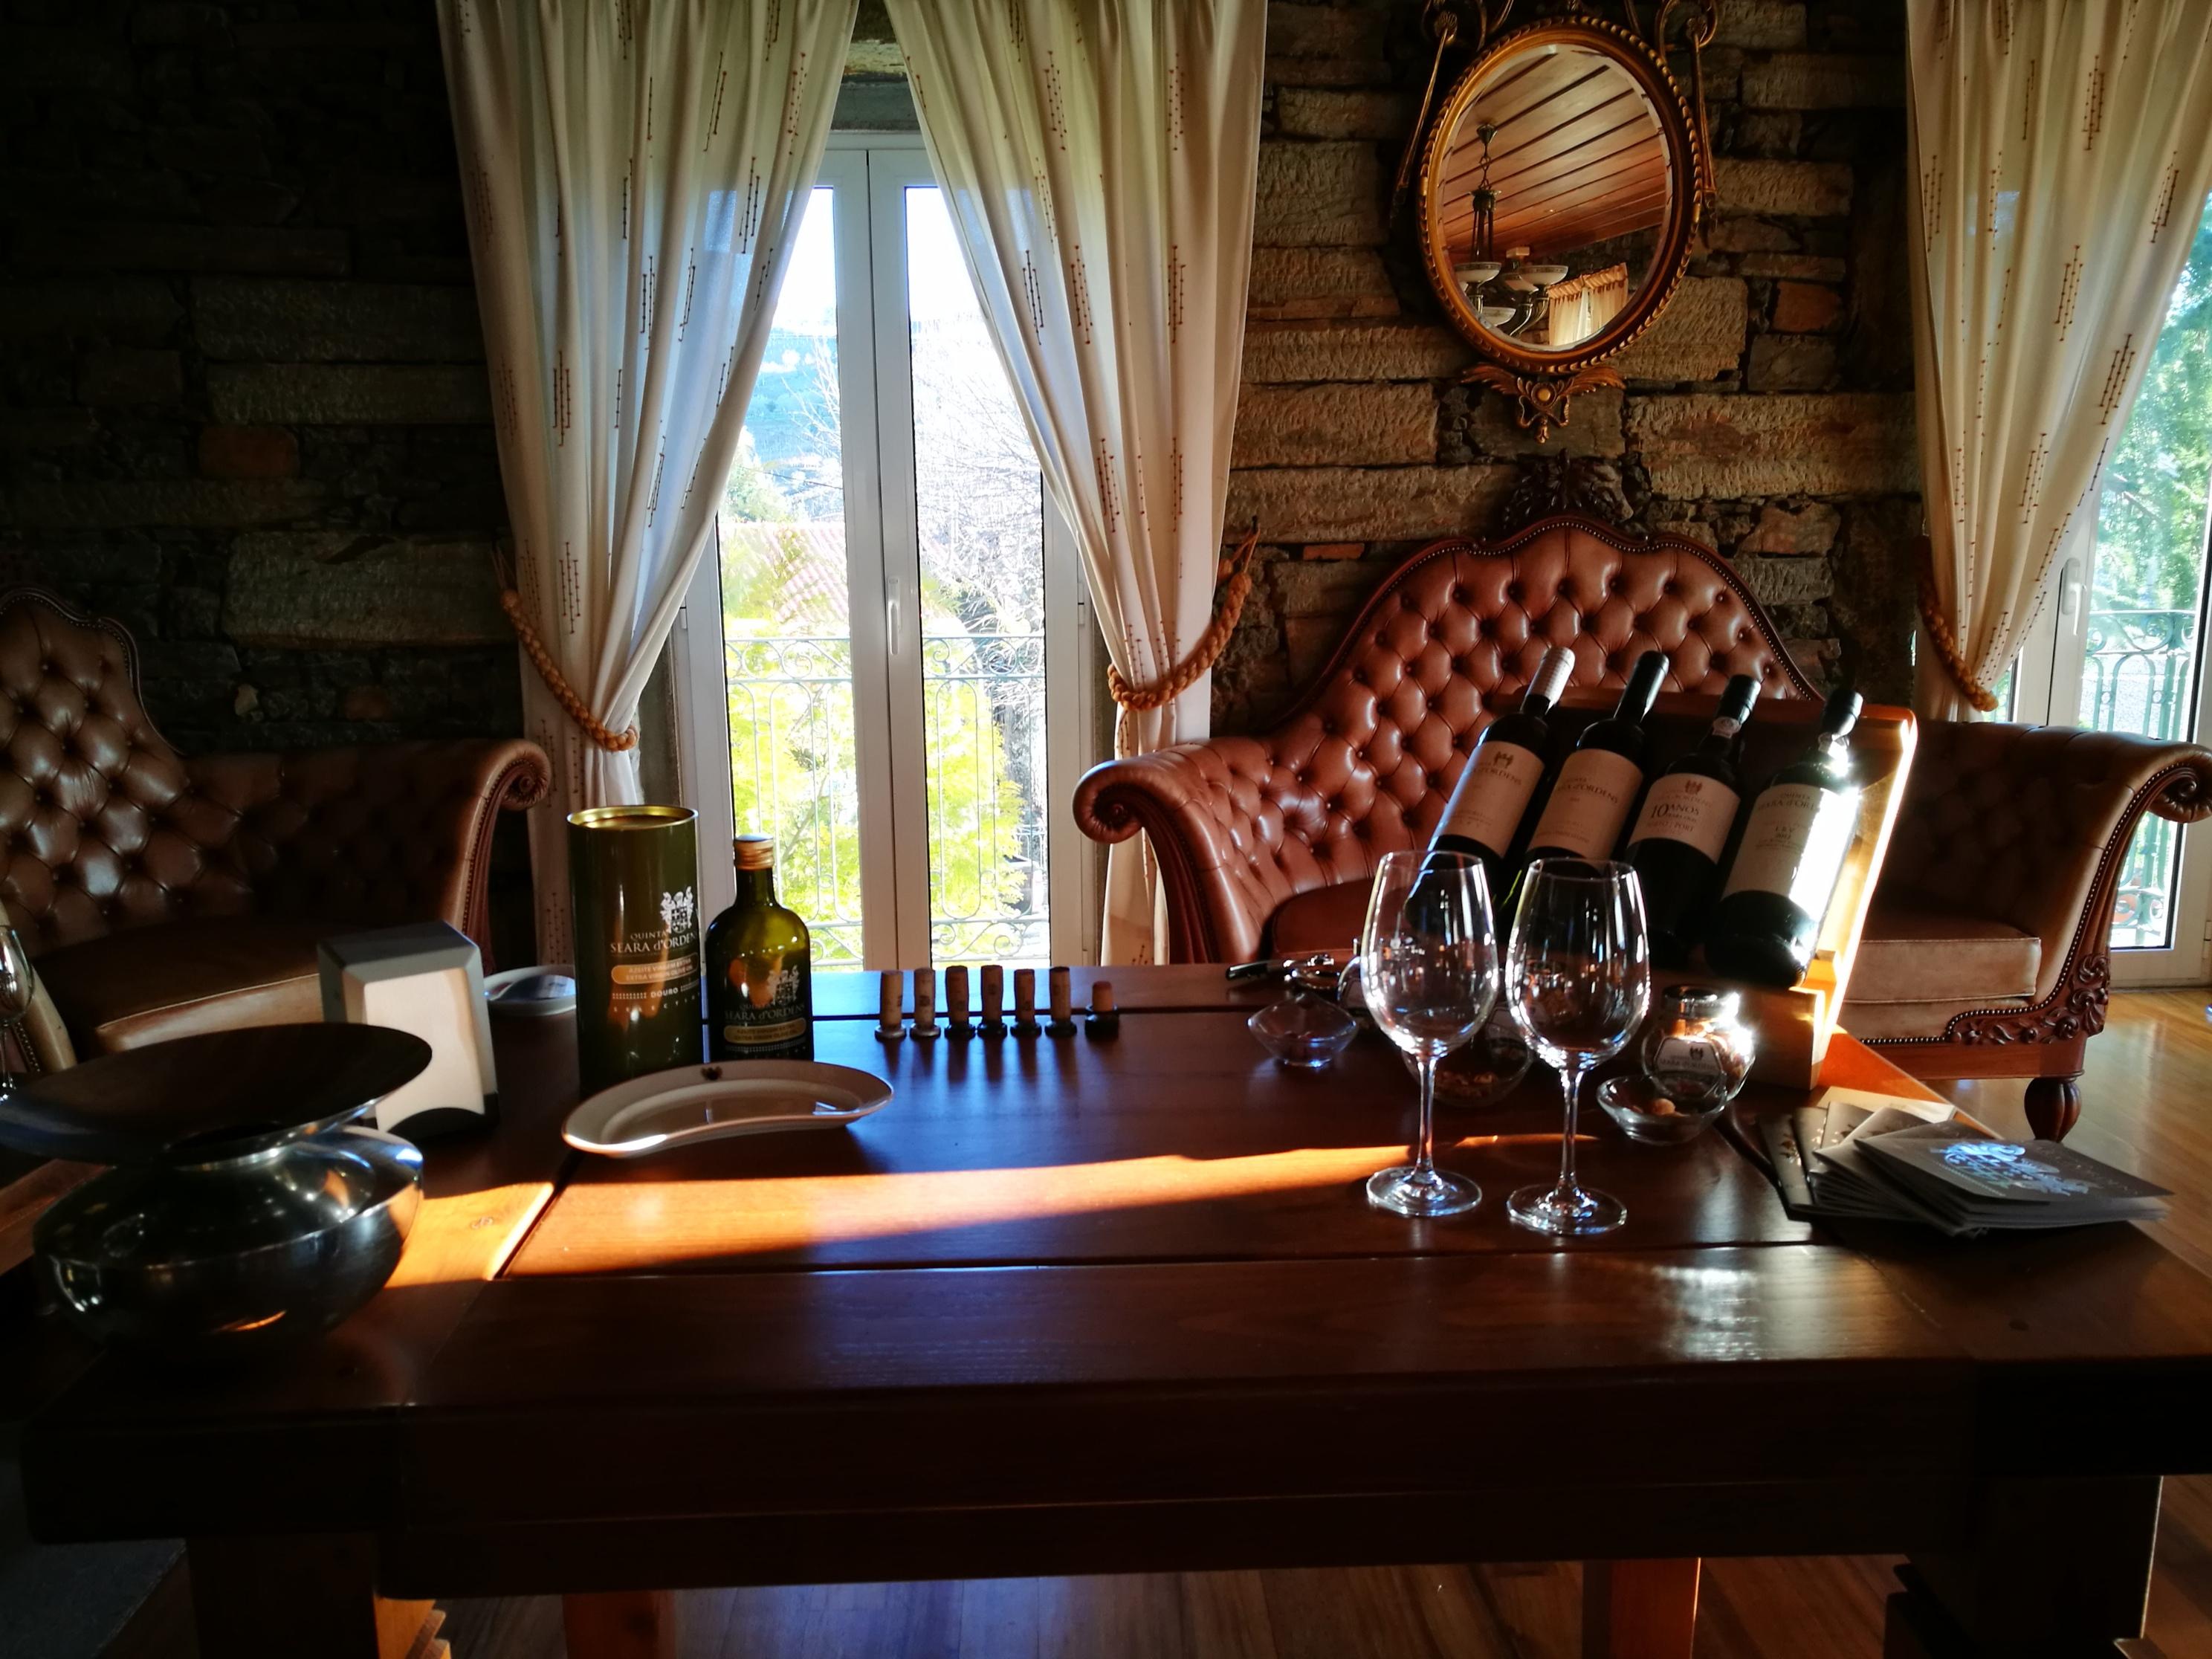 Quinta Seara d'Ordens - Visita & Prova Privada